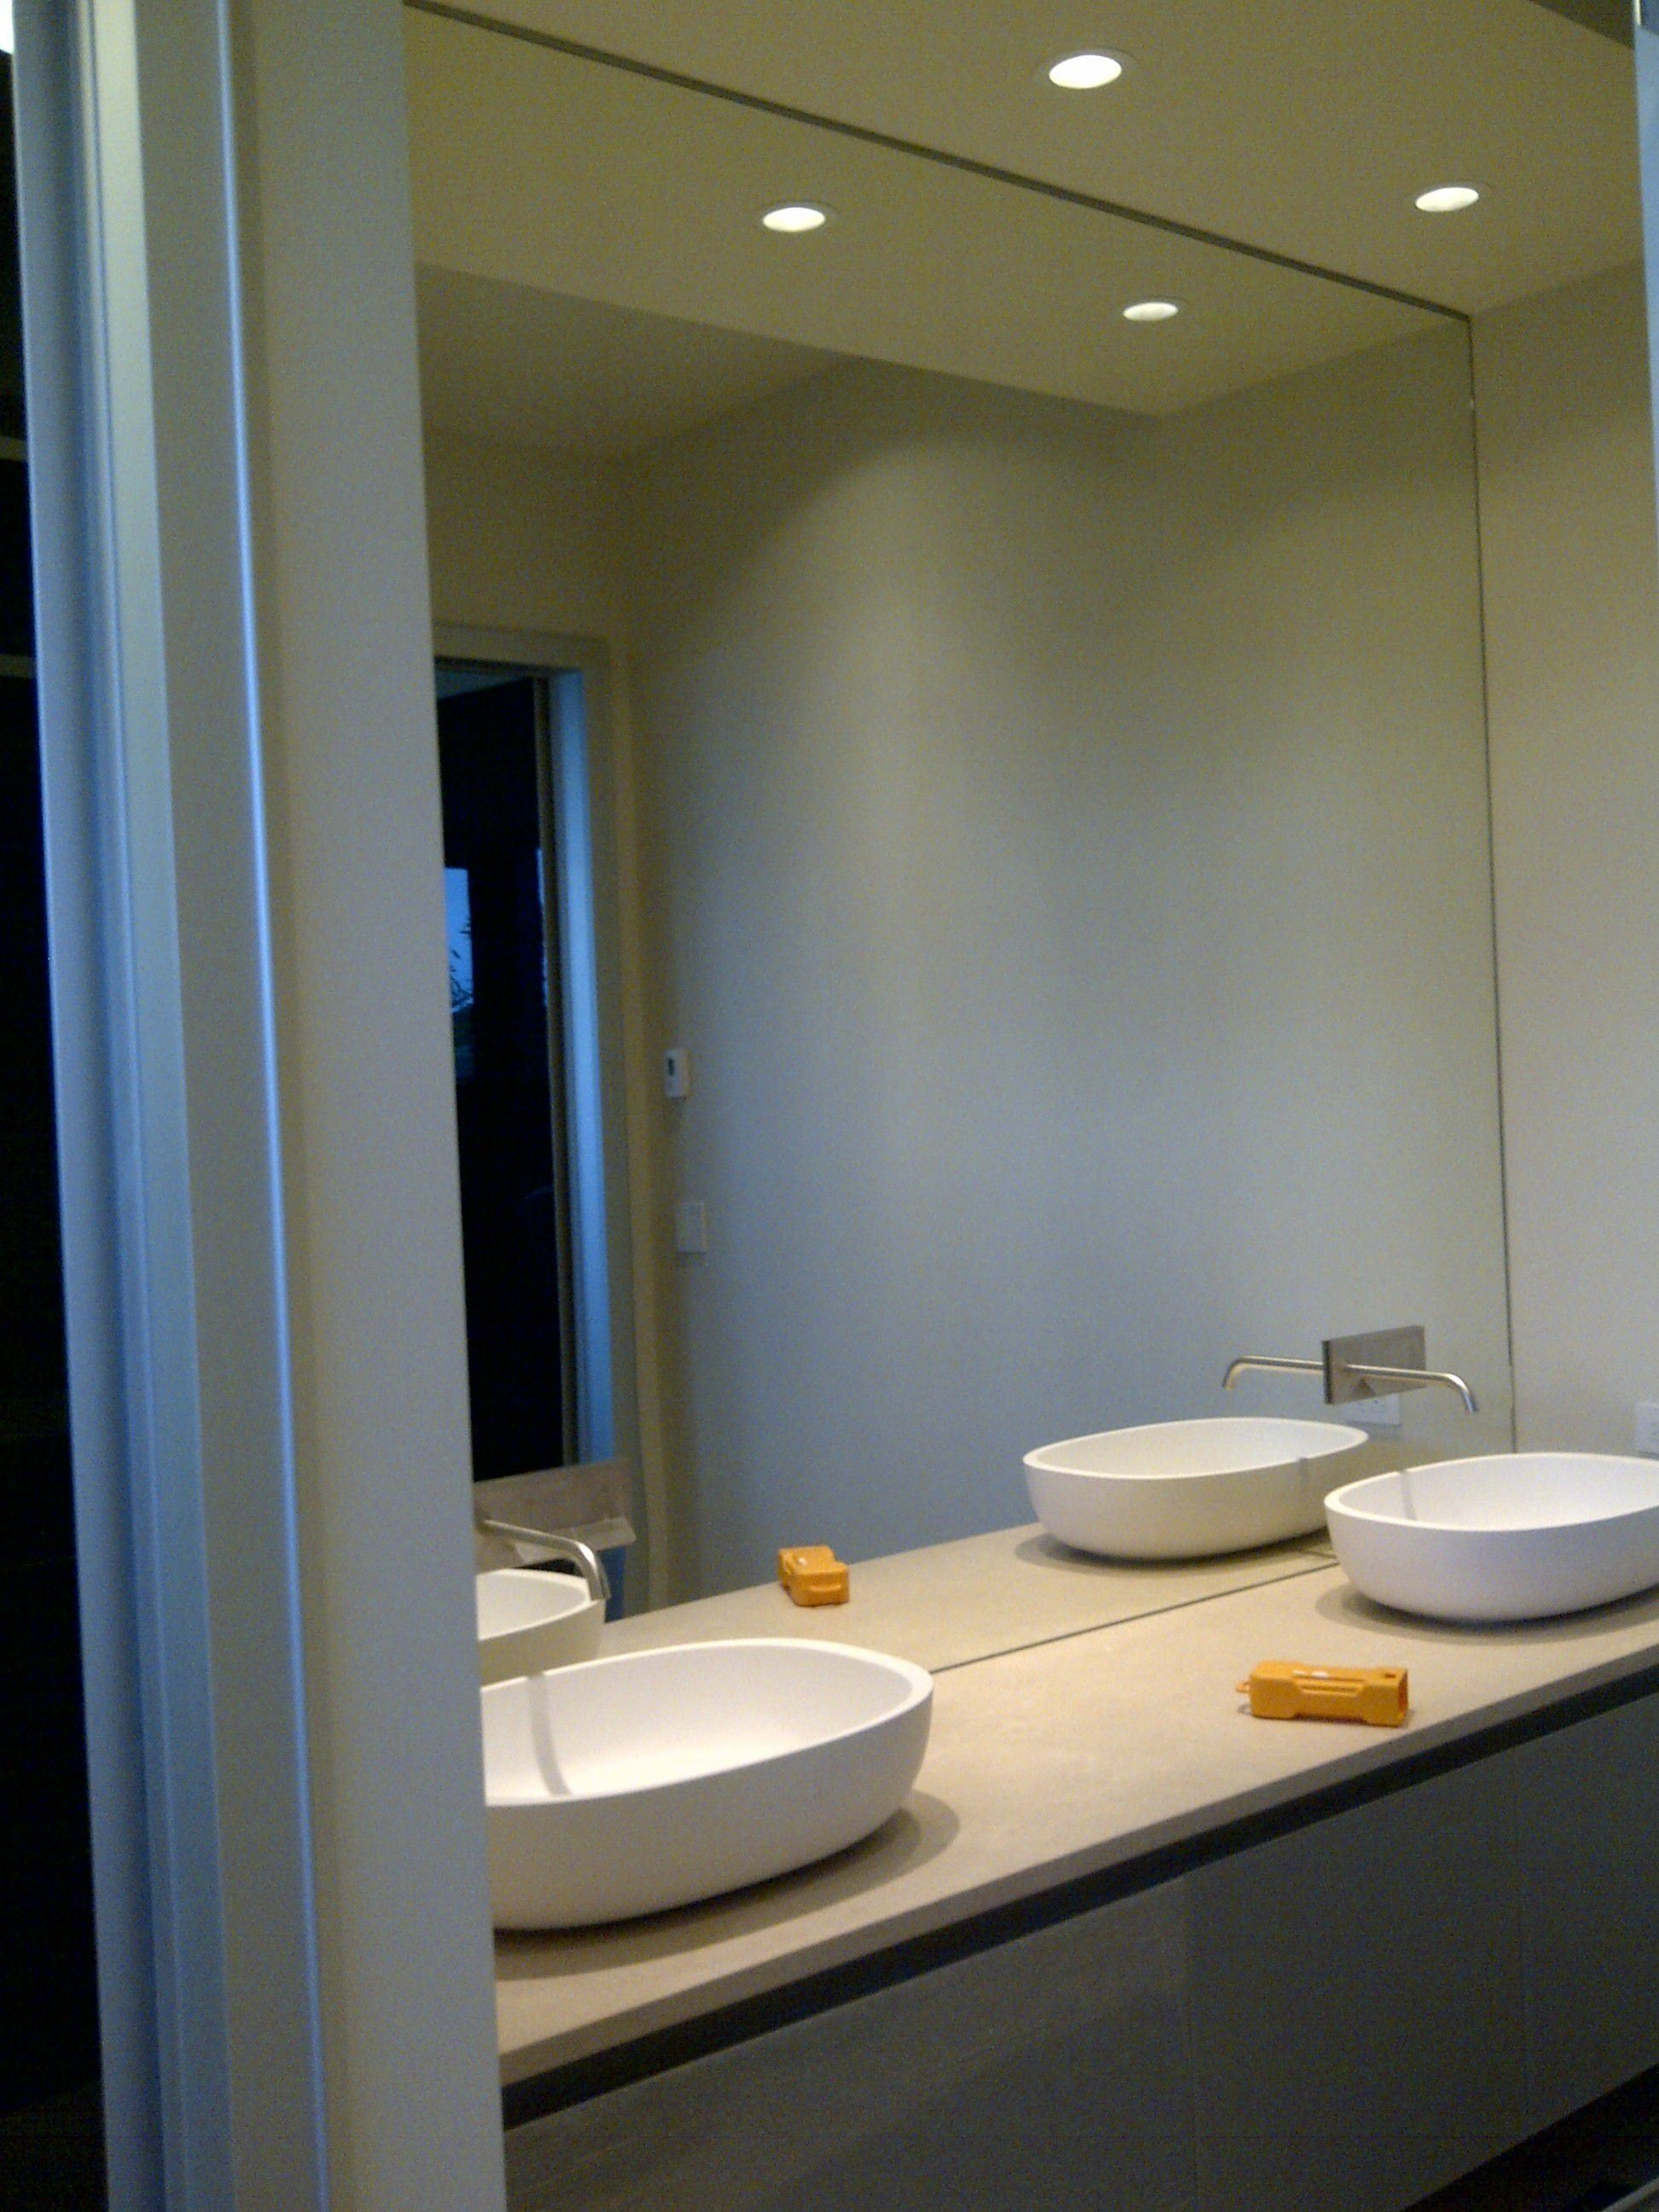 Wall Mirror Ideas Bathroom Mirror Wall Bathroom Small Bathroom